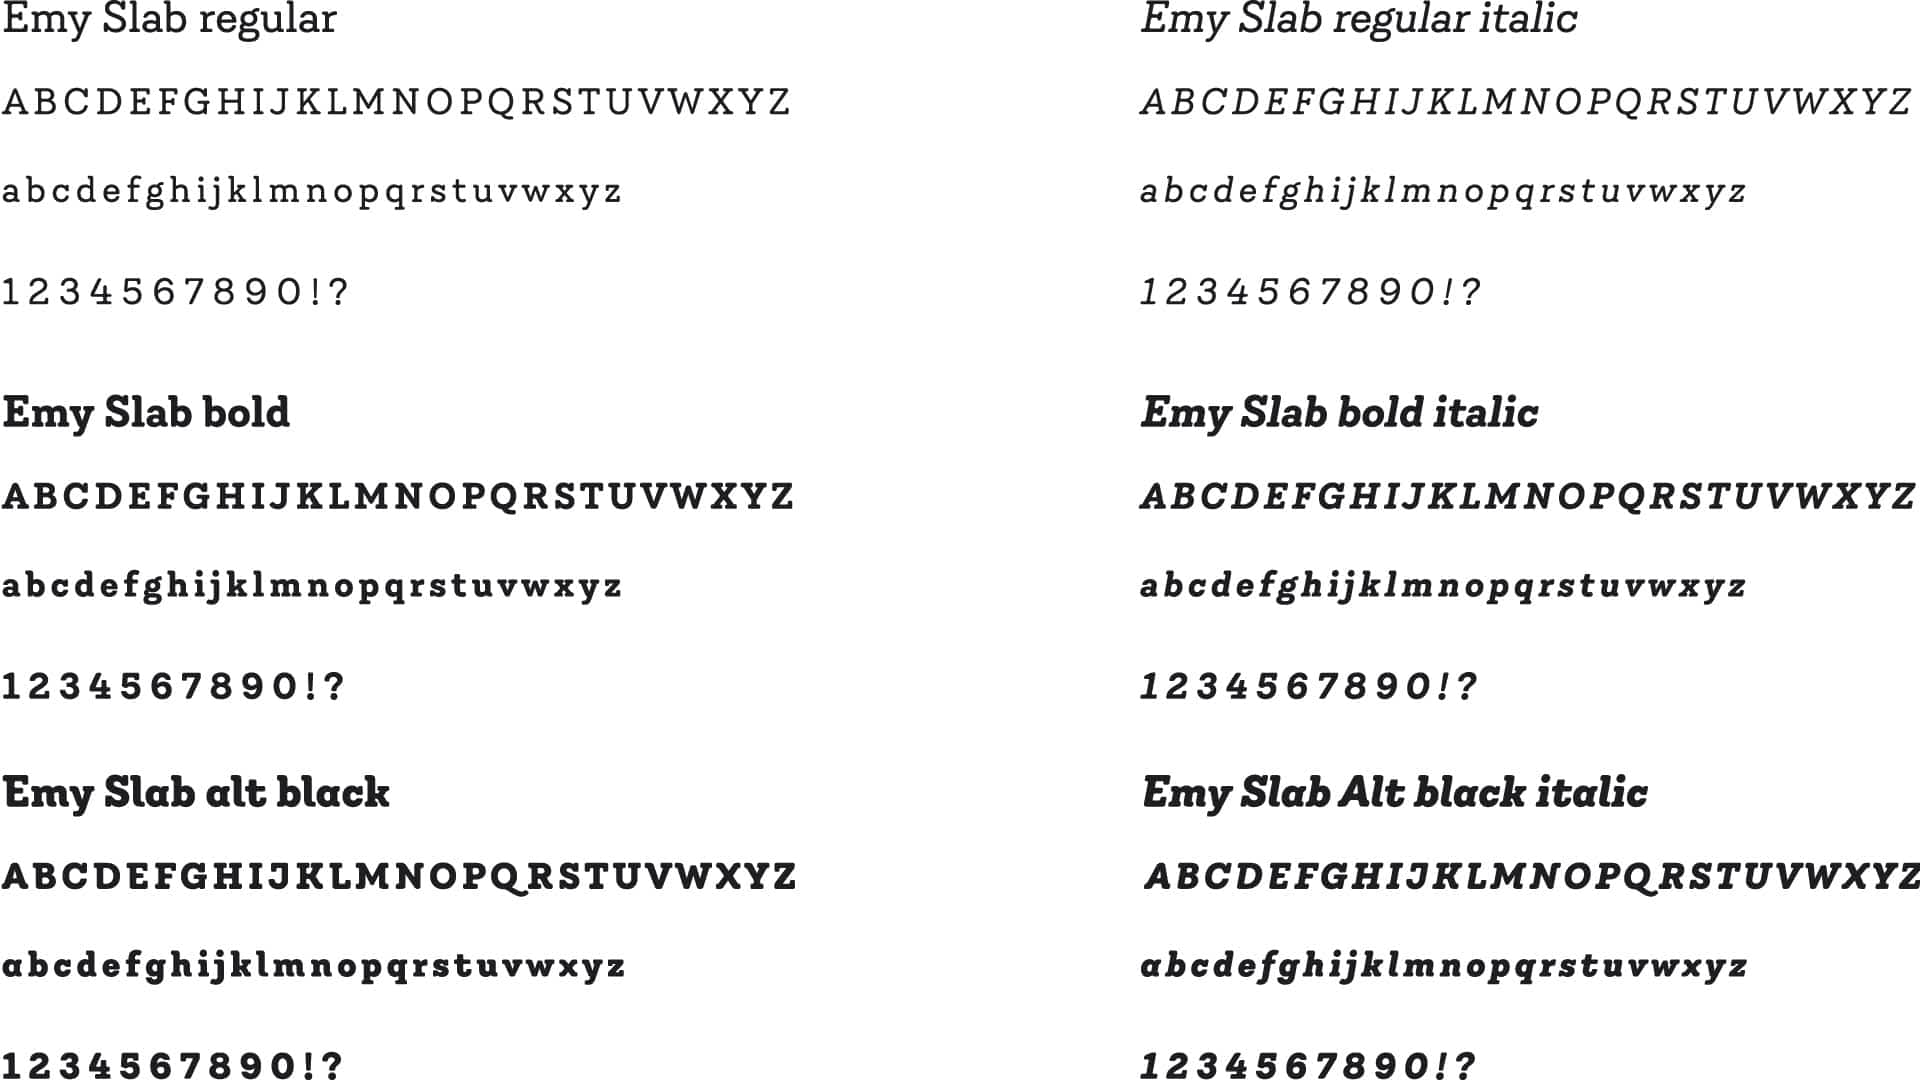 Alice_Stivala_Visual_Designer_Yucca_tipografia_